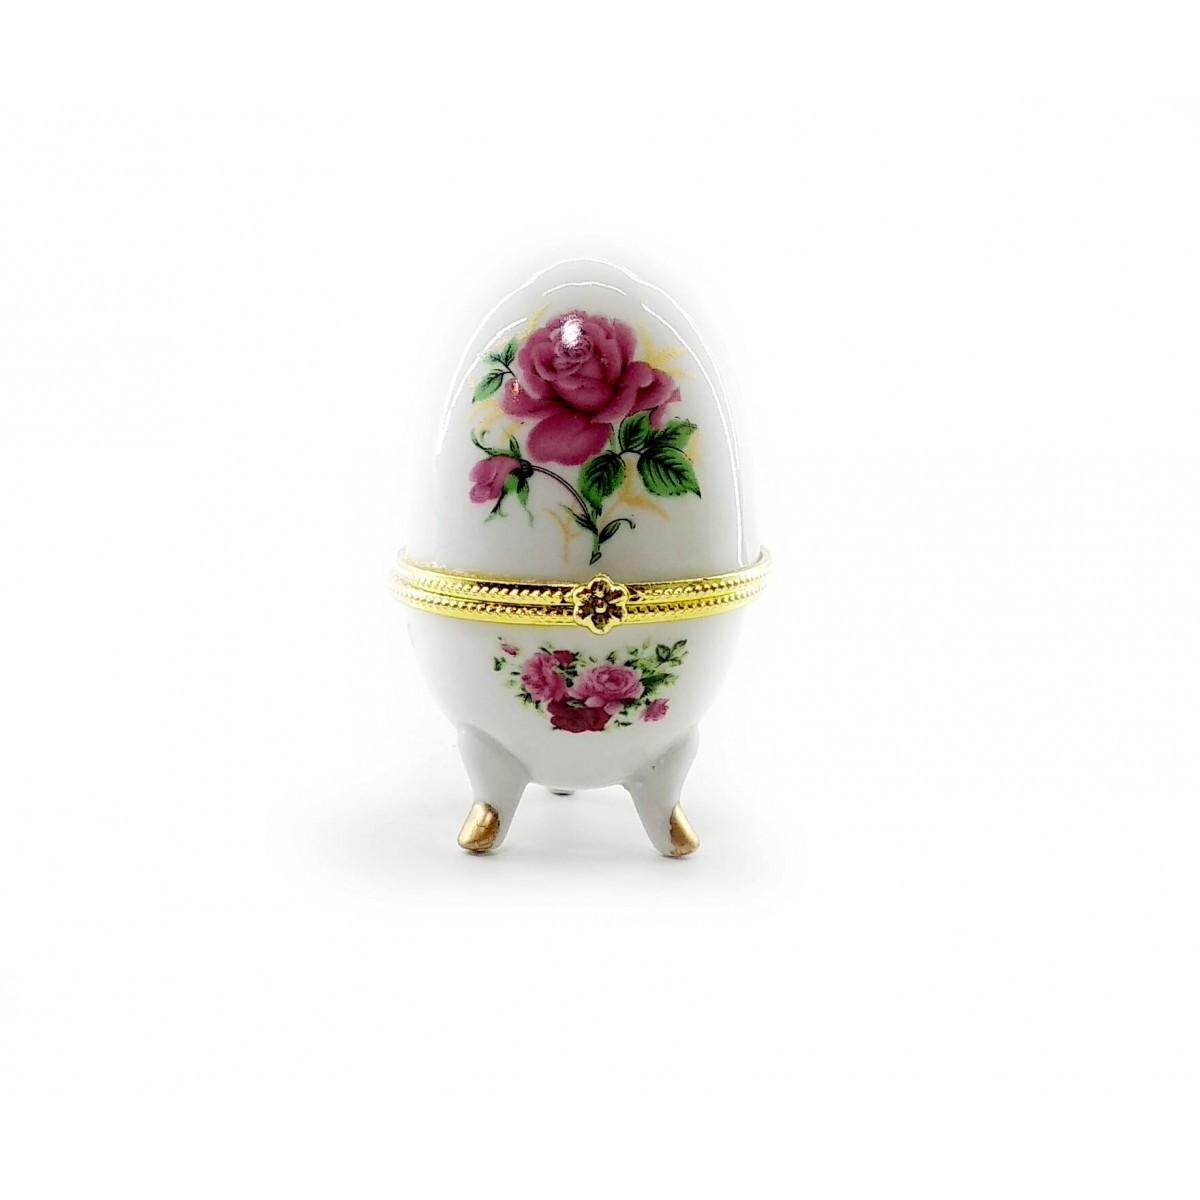 Шкатулка яйцо из керамики Розы